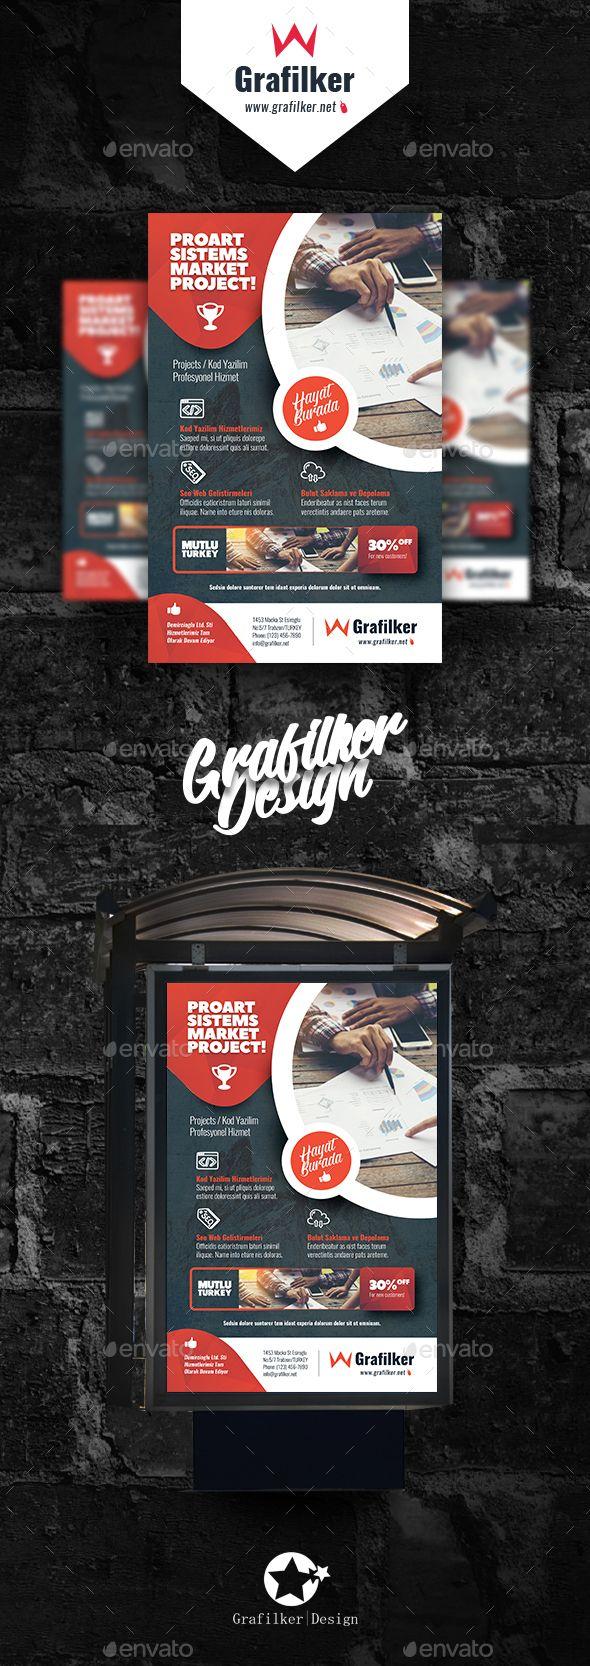 Marketing Poster Template PSD, InDesign INDD   Design Inspiration ...